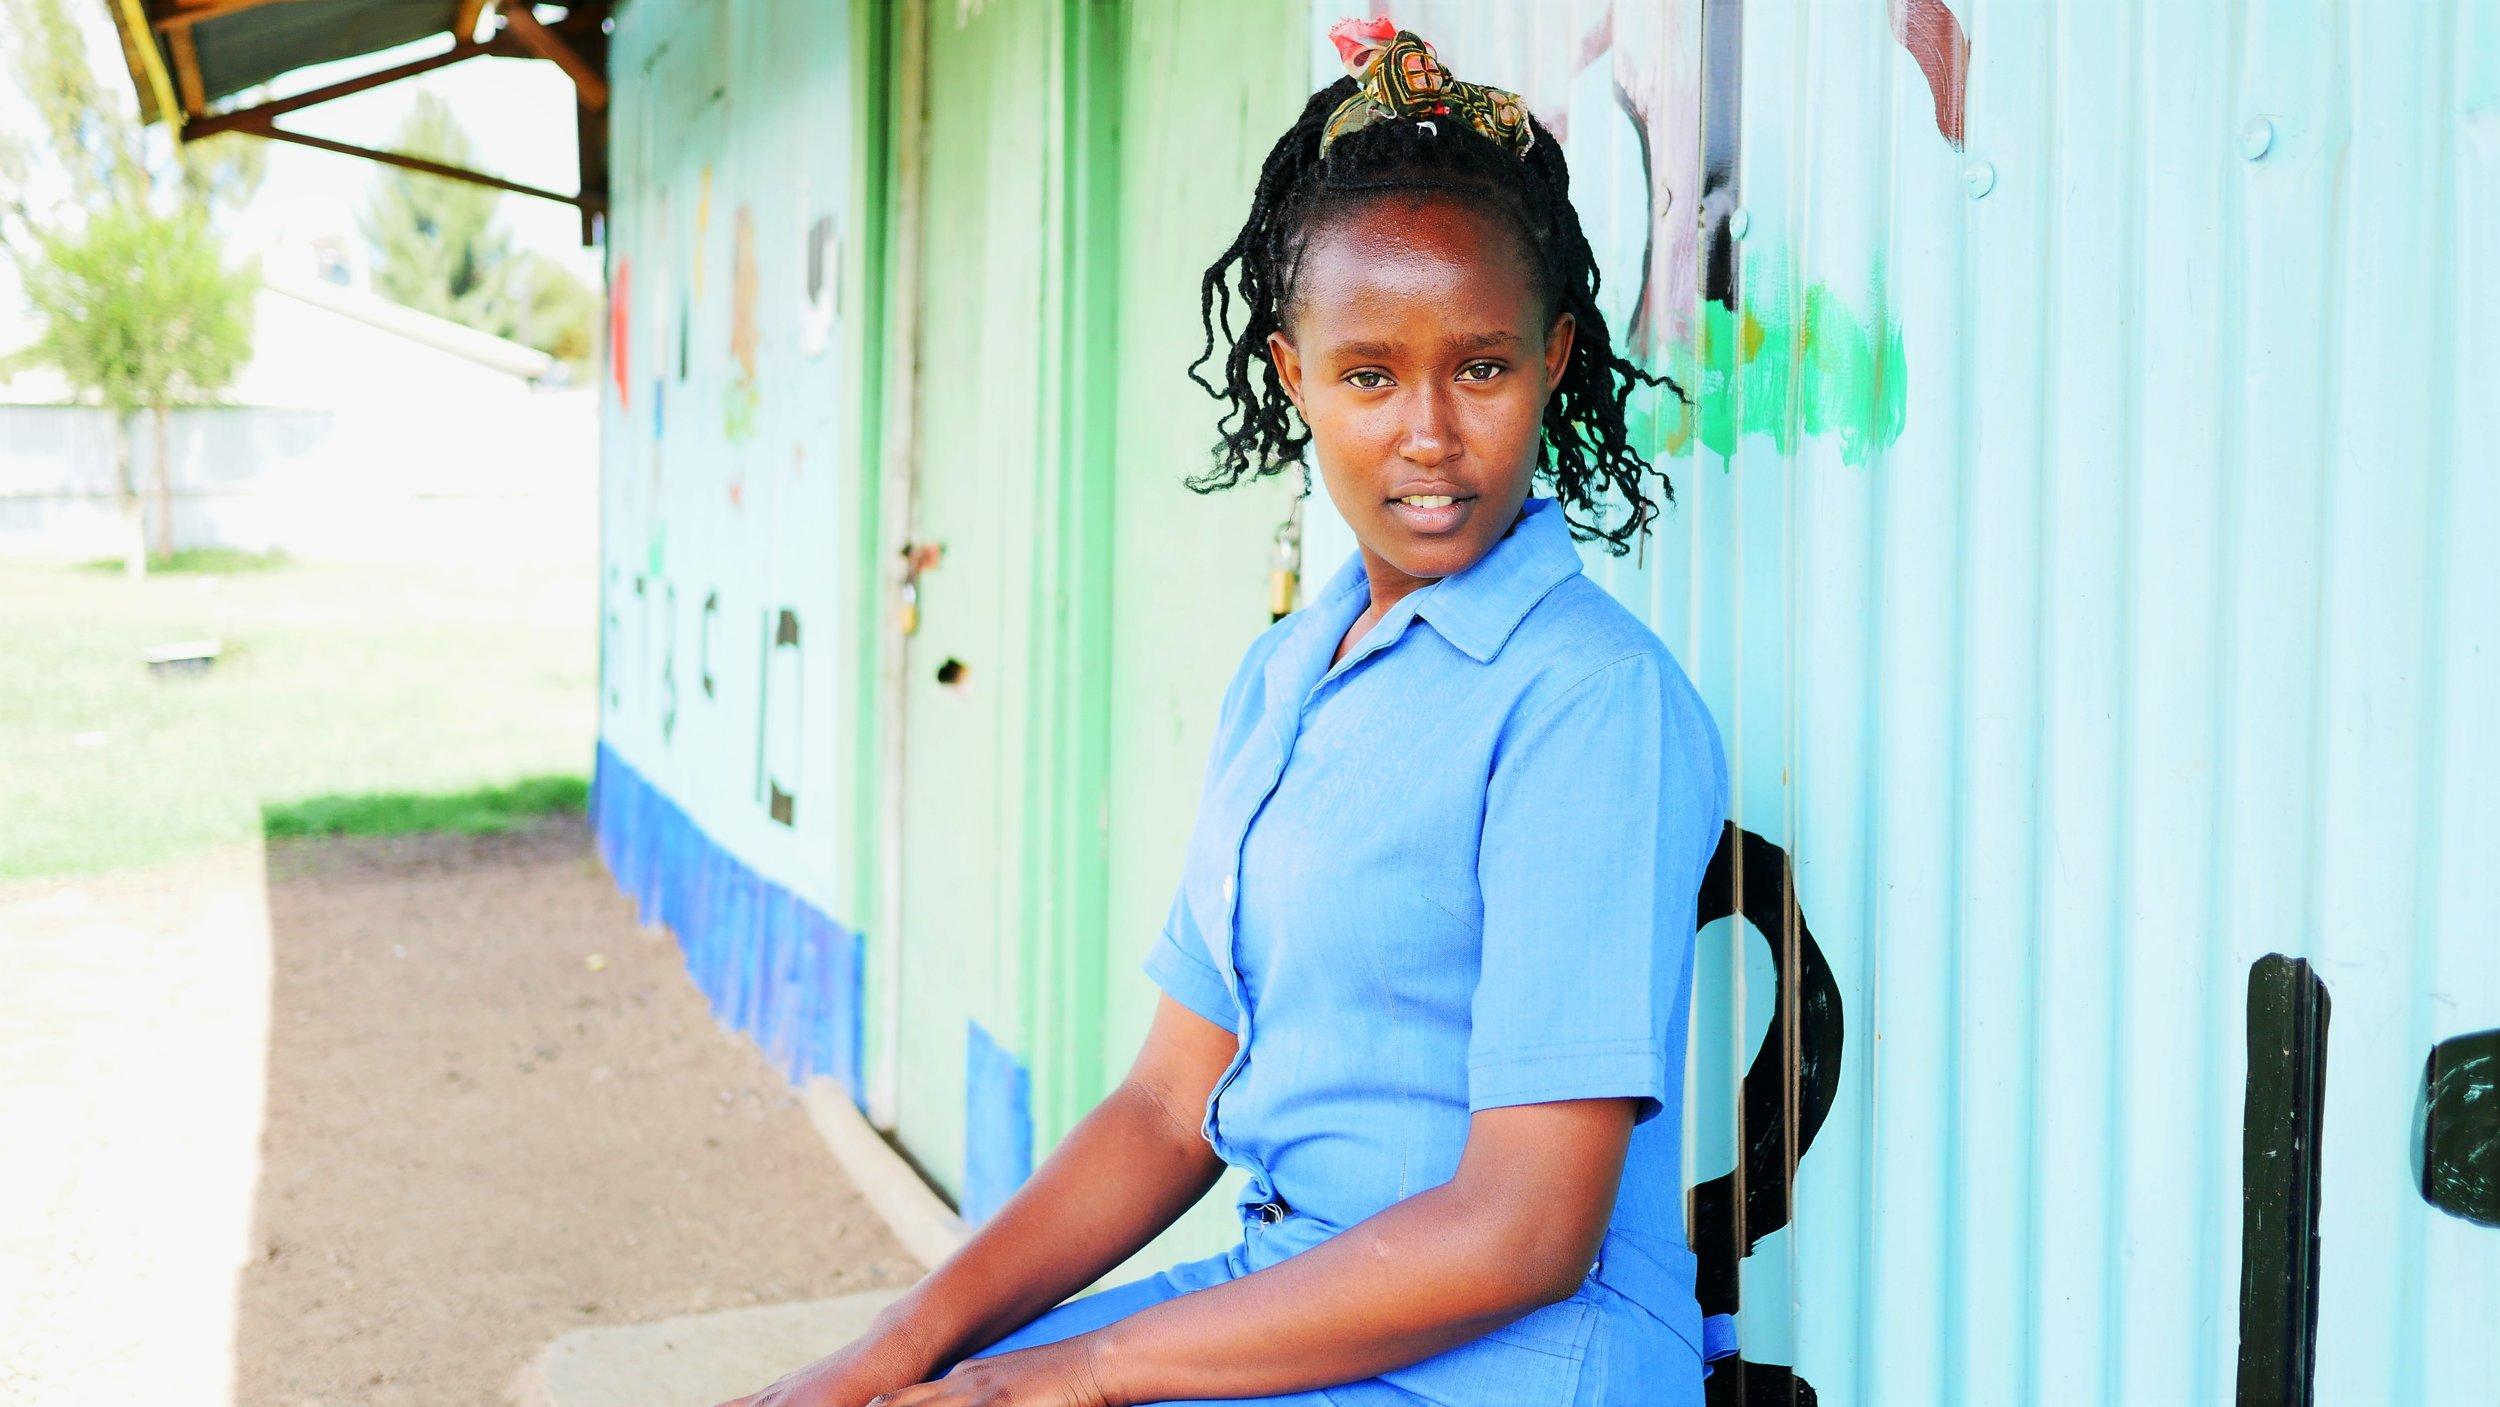 Ann Nyambura Mwangi. Photo: Elfi Thrane Bemelmans